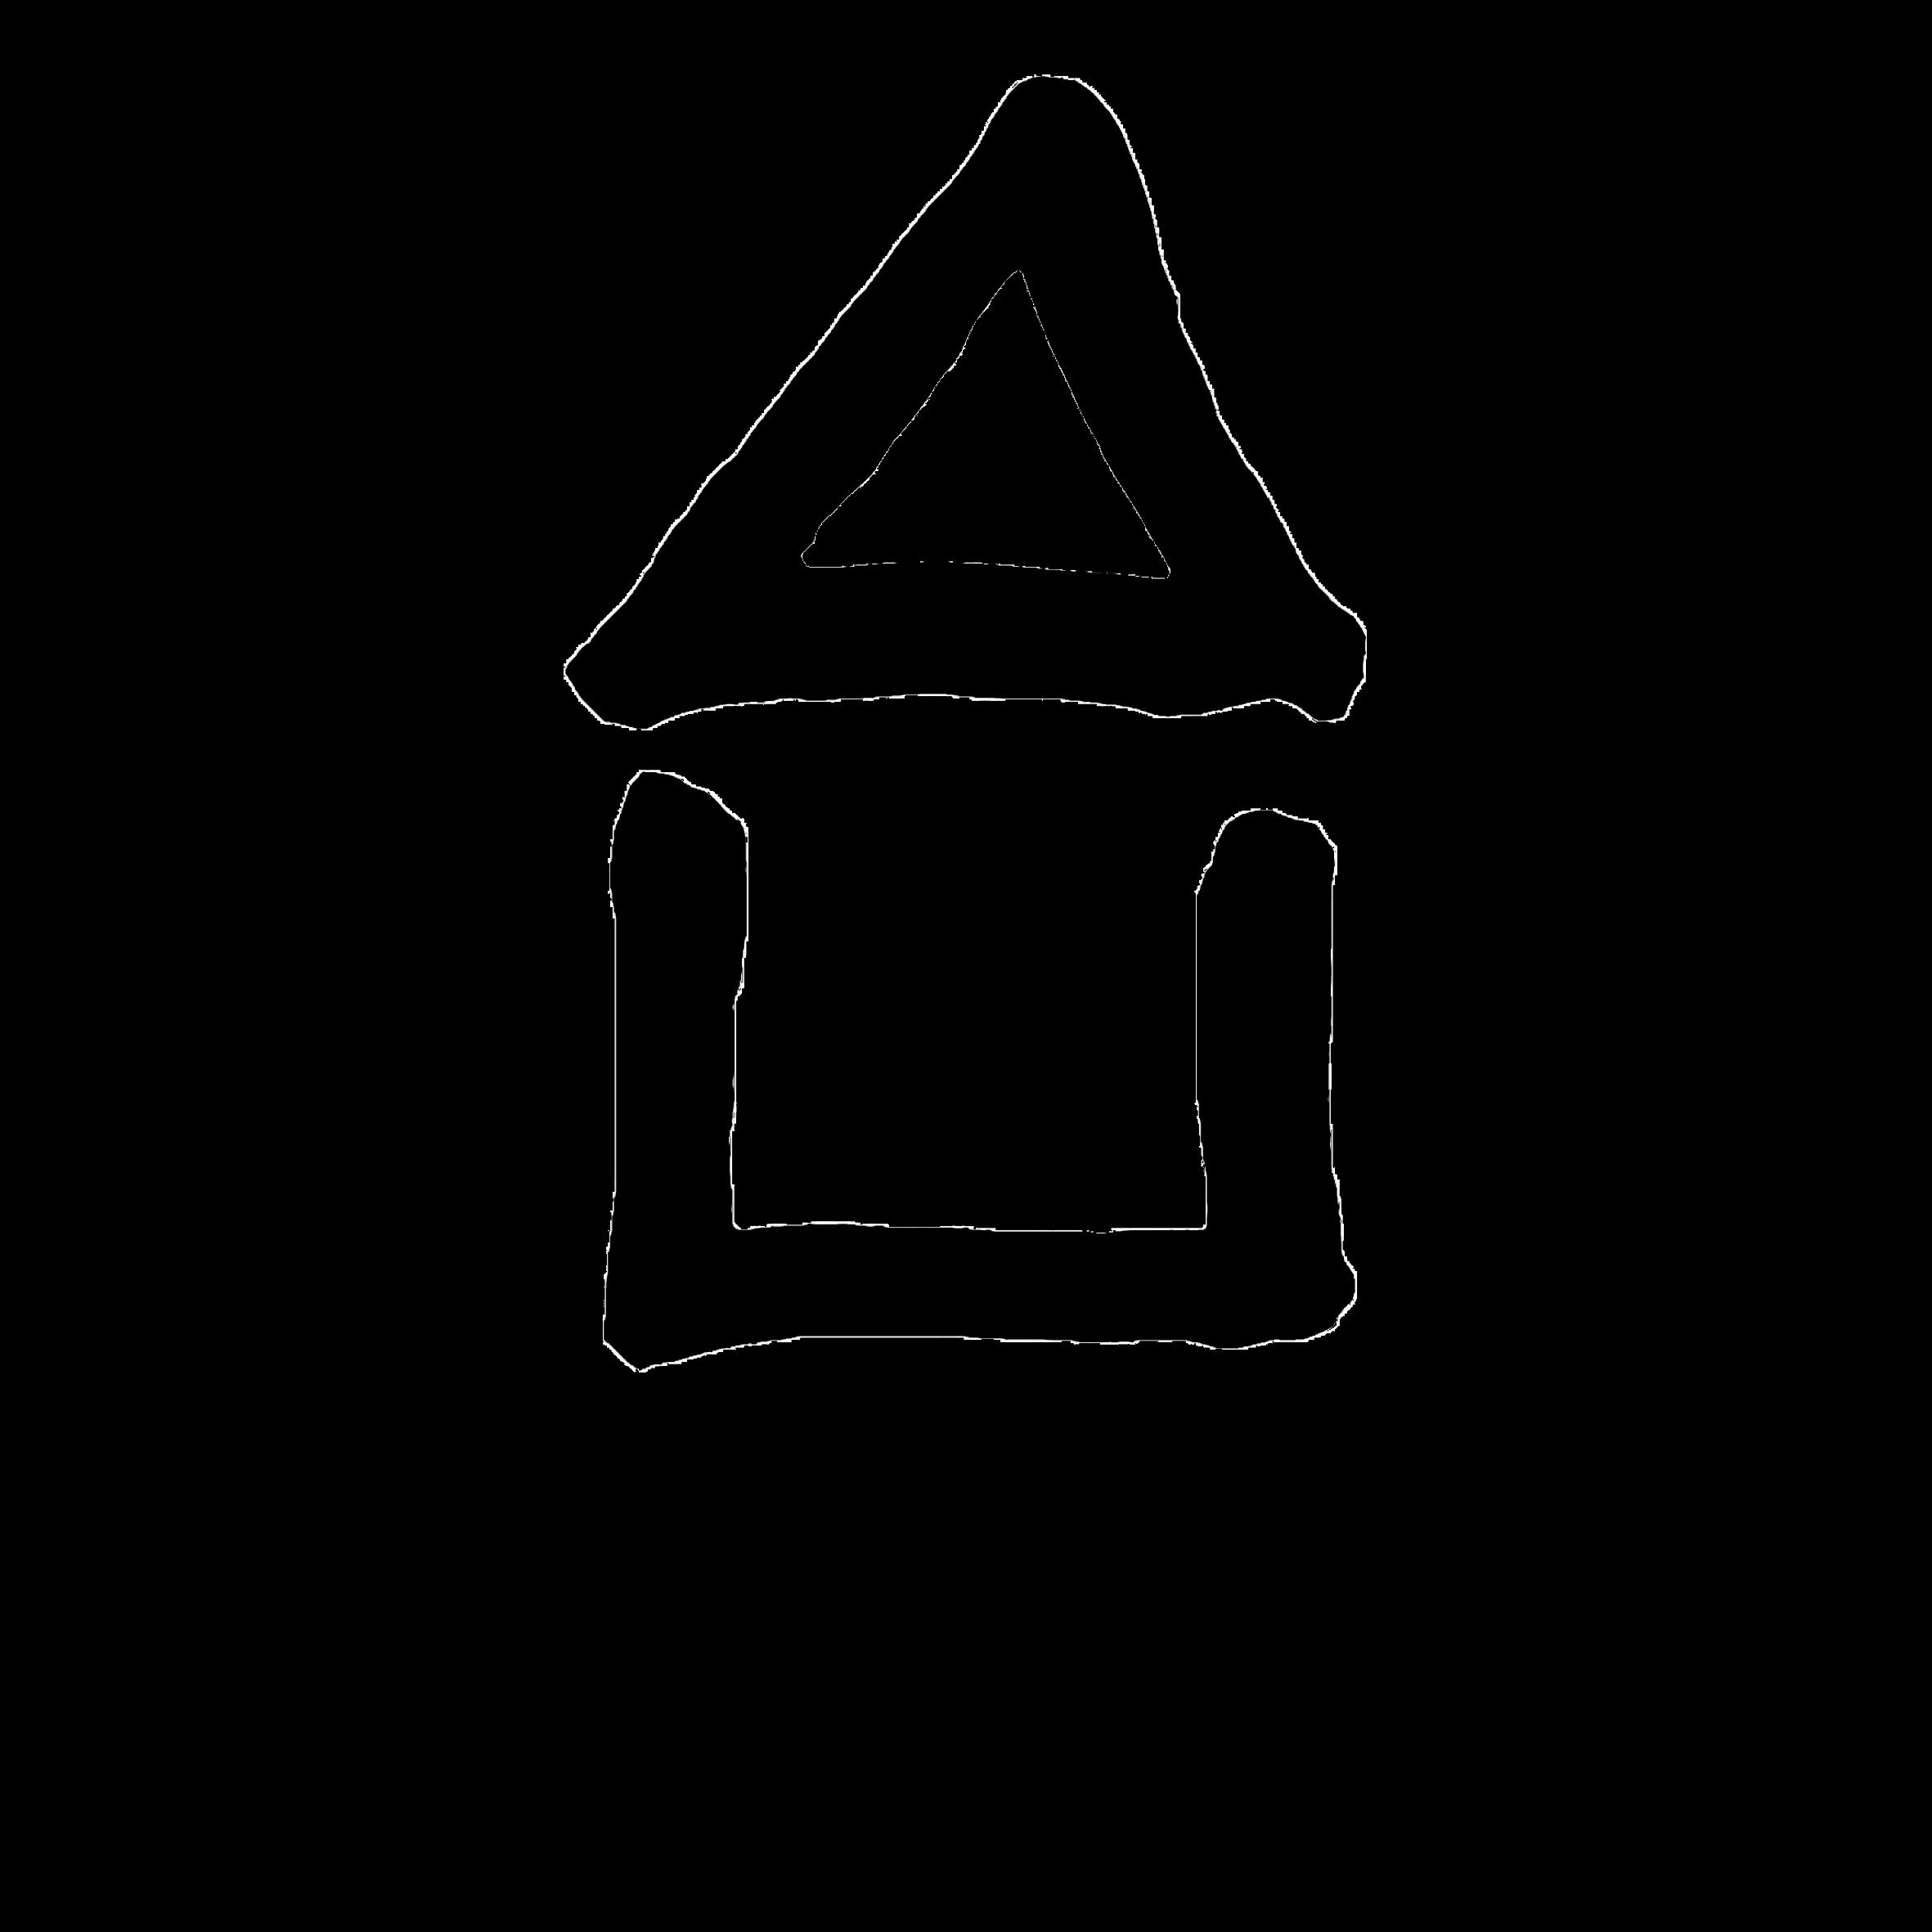 24_Eckhaus Onlineshop Logo